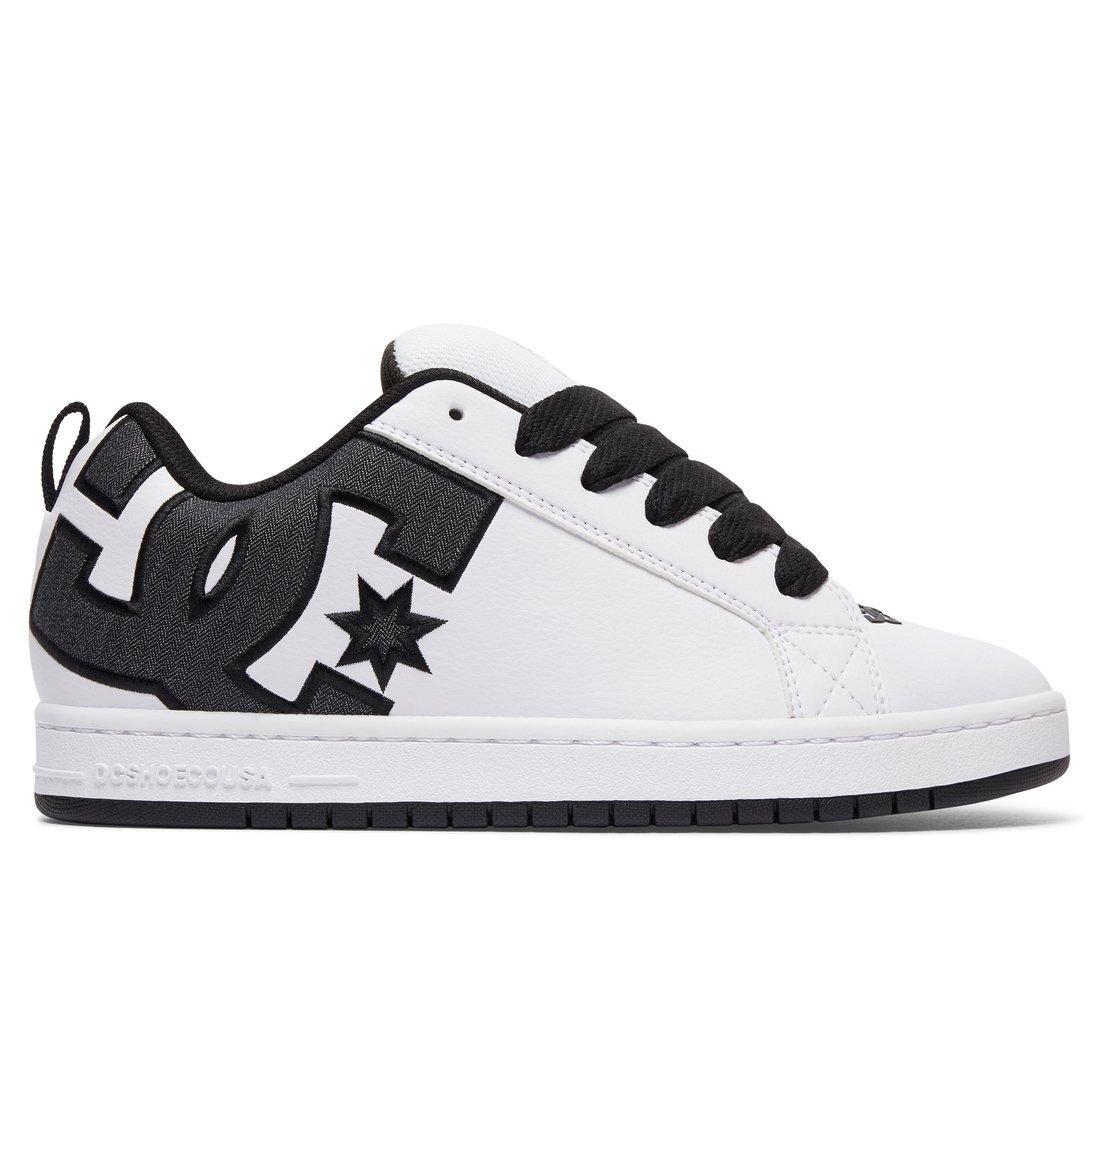 dc scarpe Court Graffik SE - Scarpe da Uomo - White - DC scarpe Precio Barato De Alta Calidad 4KyVeJA